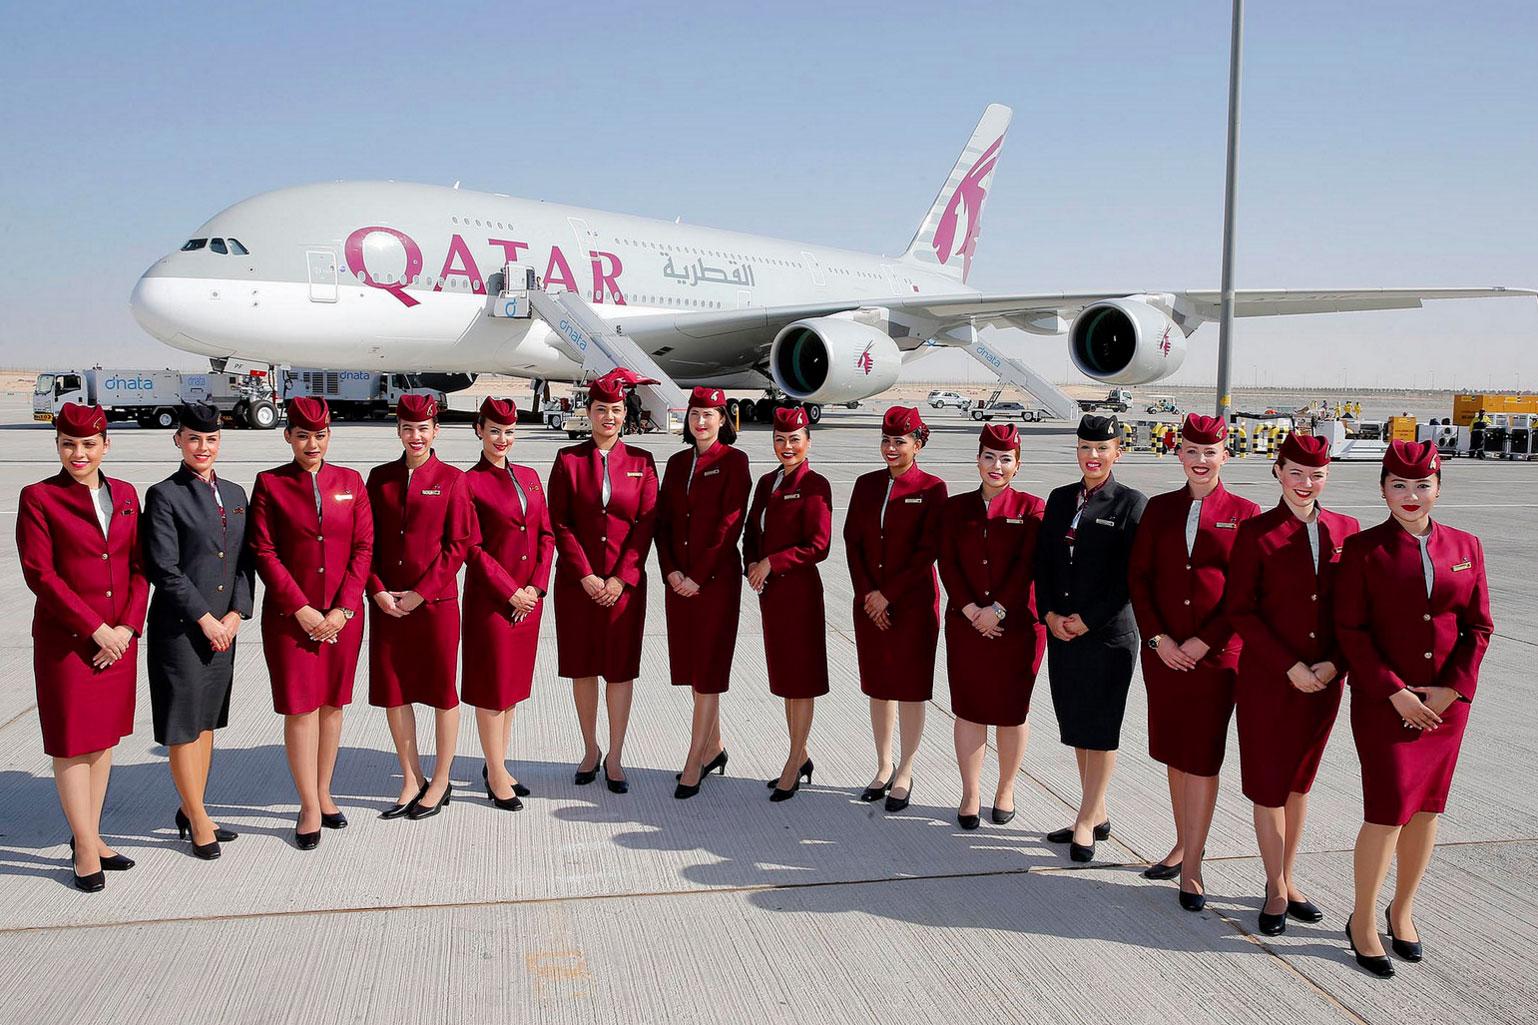 Ghana: Qatar Airways to start operations soon